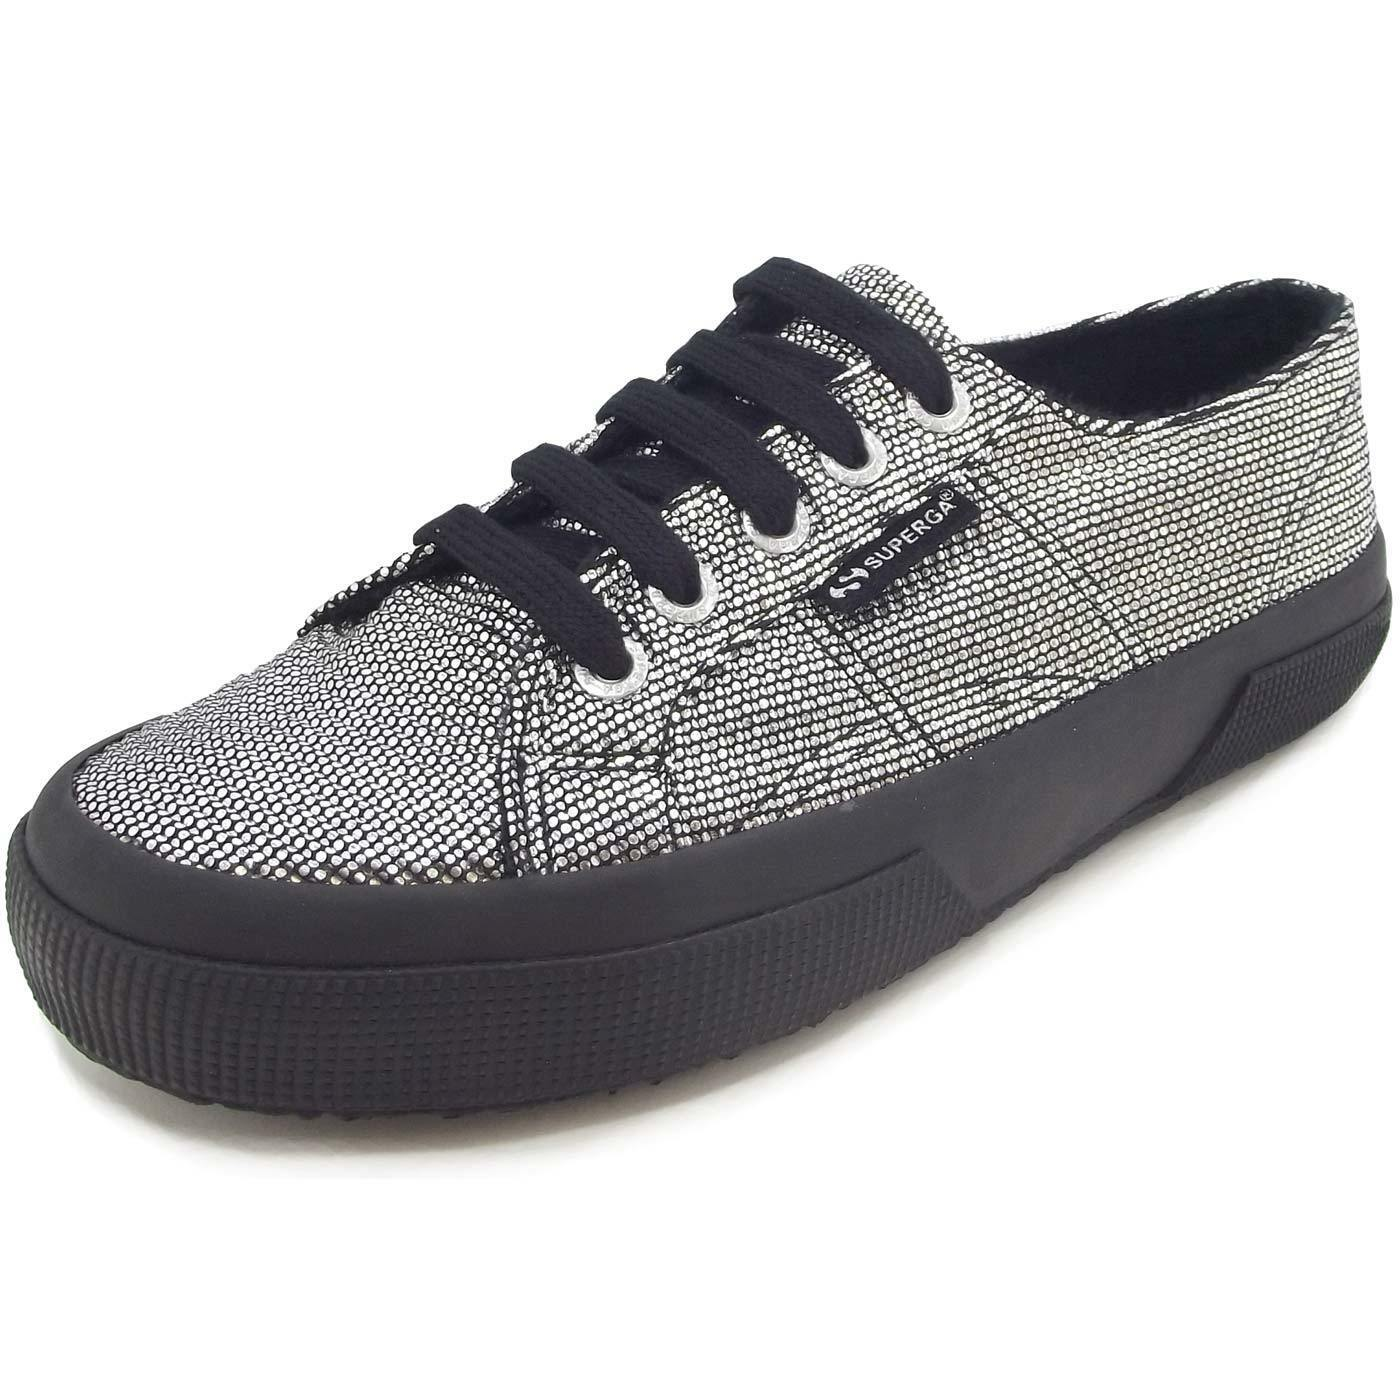 Superga 2750 Plisselamew Damen Sneaker silber/schwarz (Grau silver)